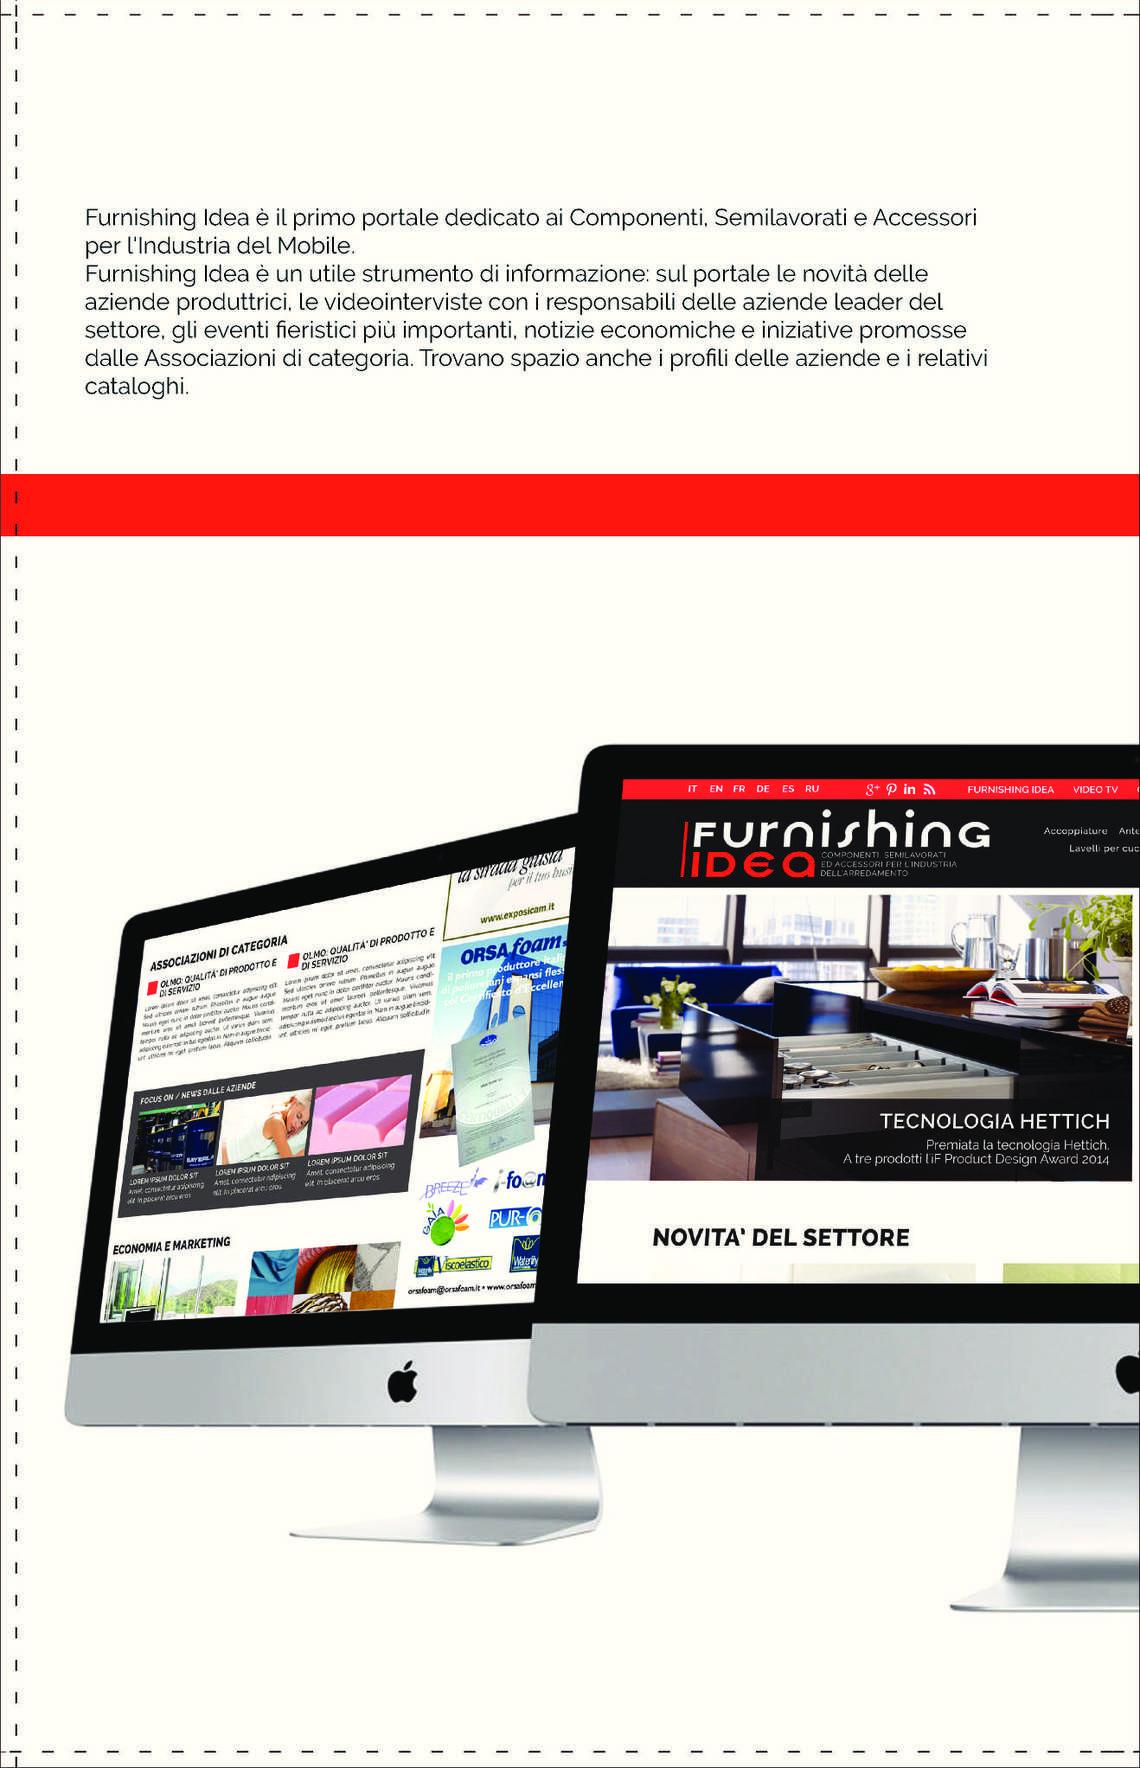 furnishing-idea-journal--1-2018_journal_9_031.jpg